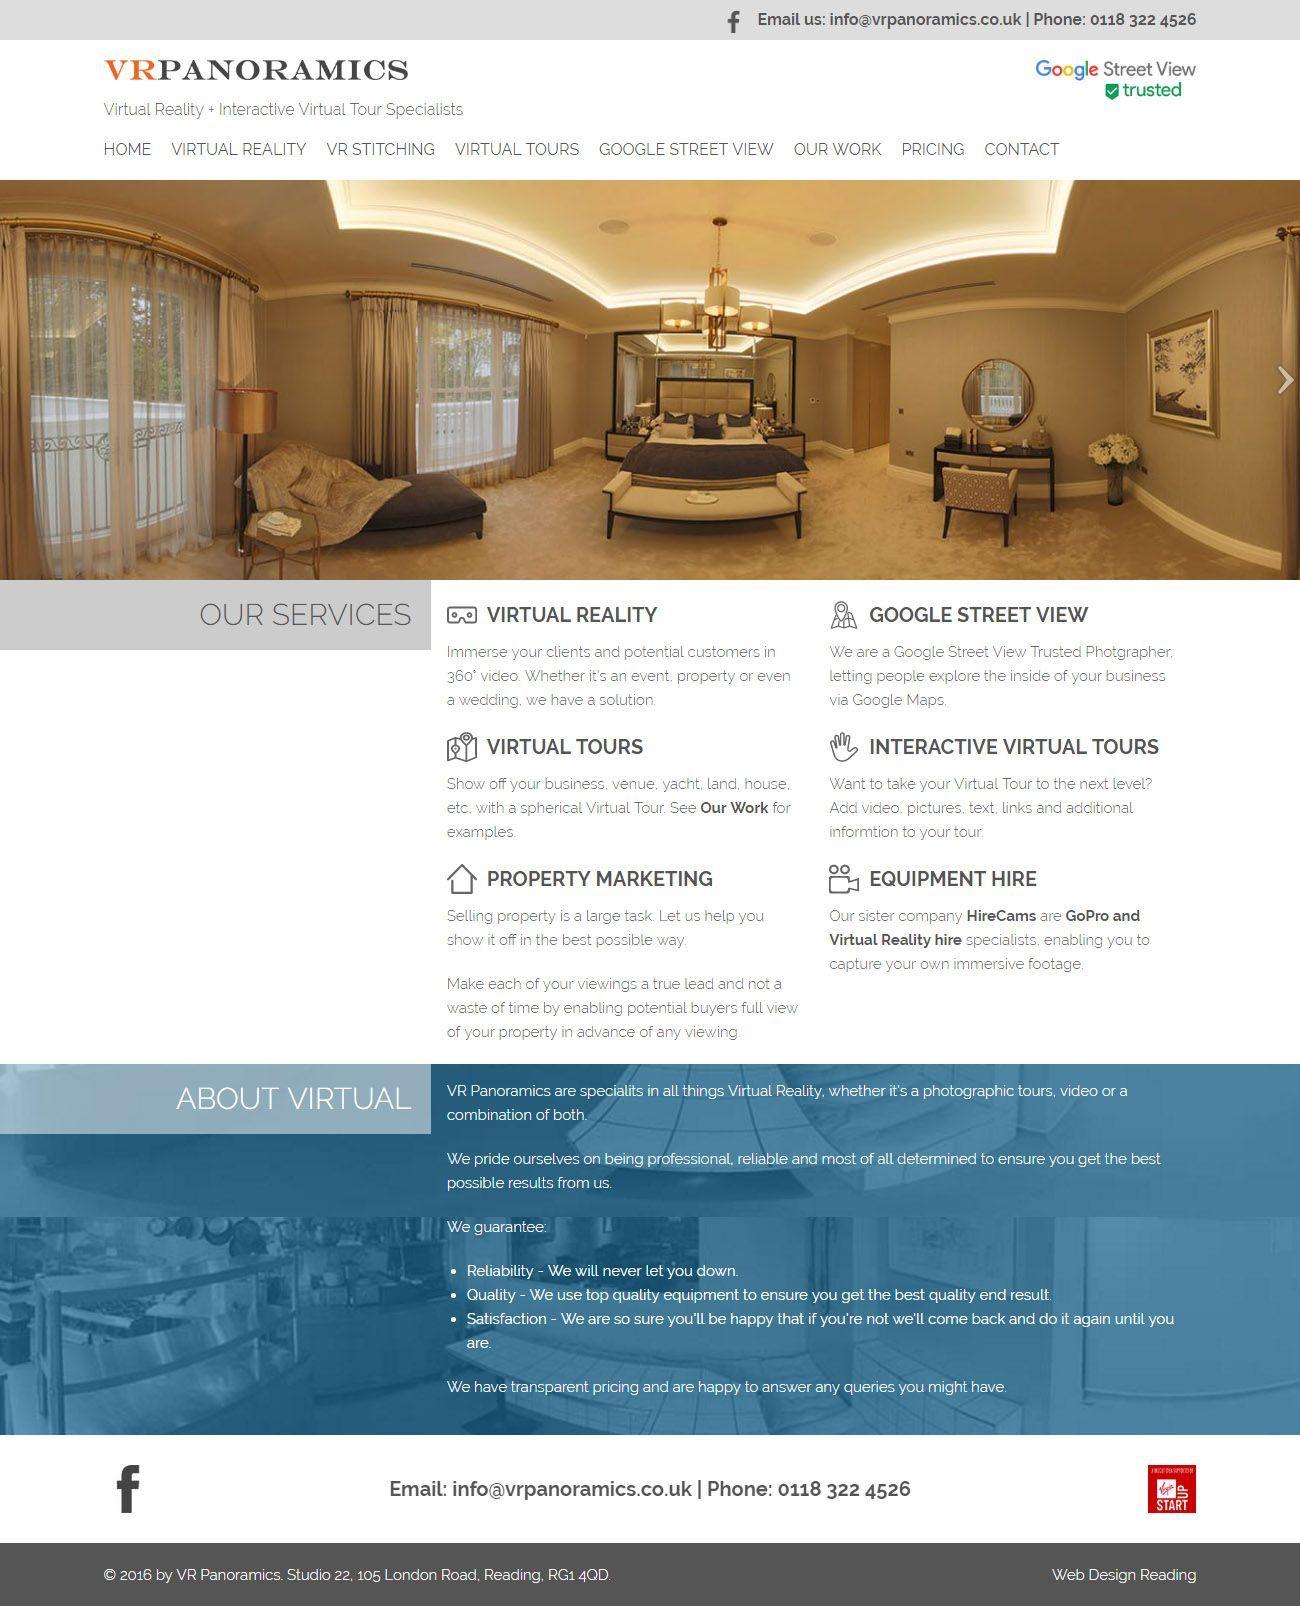 vrpano-hire-website-design